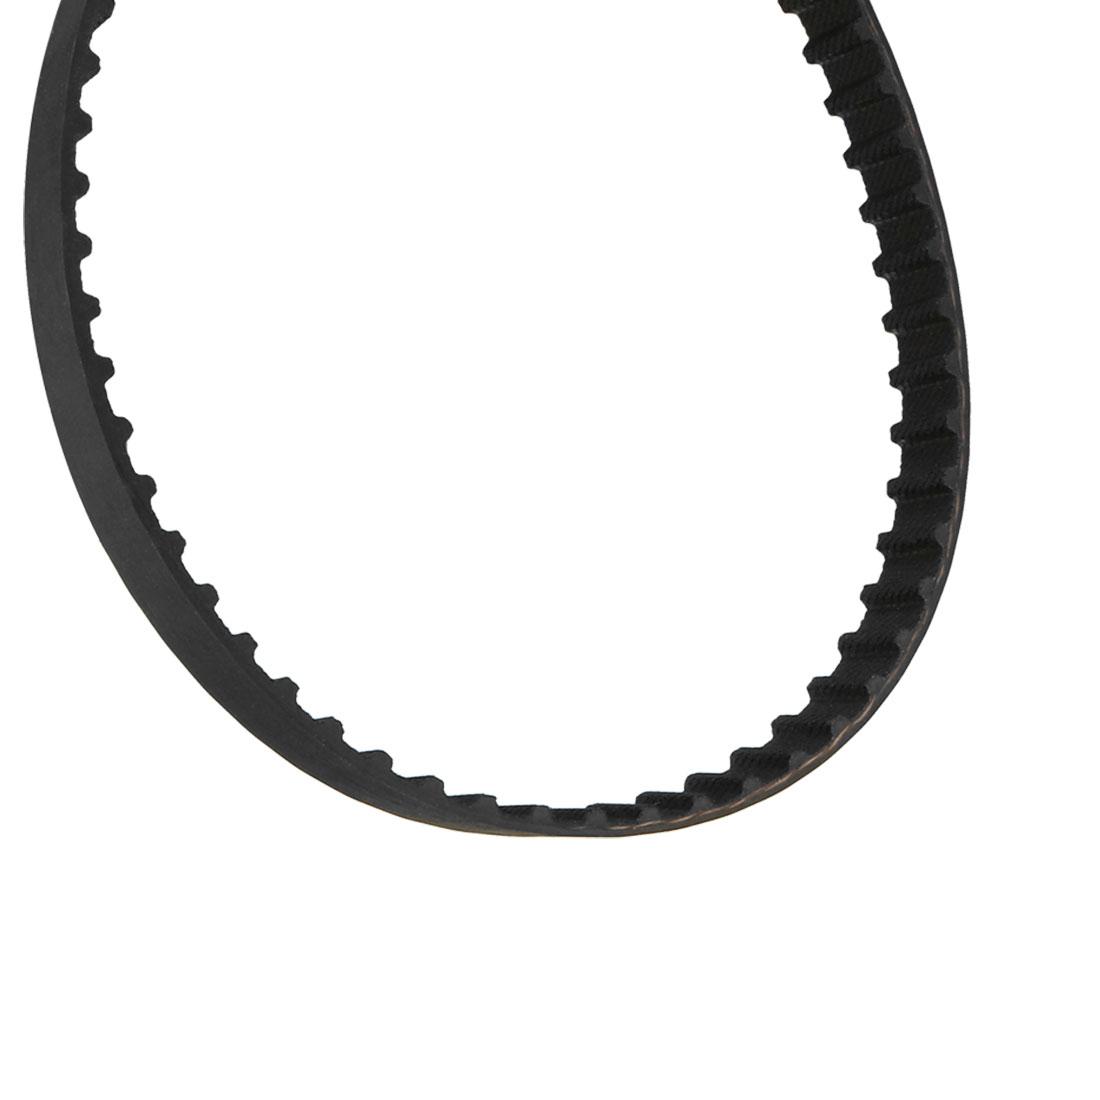 184XL 92 Teeth 10mm Width 5.08mm Pitch Stepper Motor Rubber Timing Geared Belt